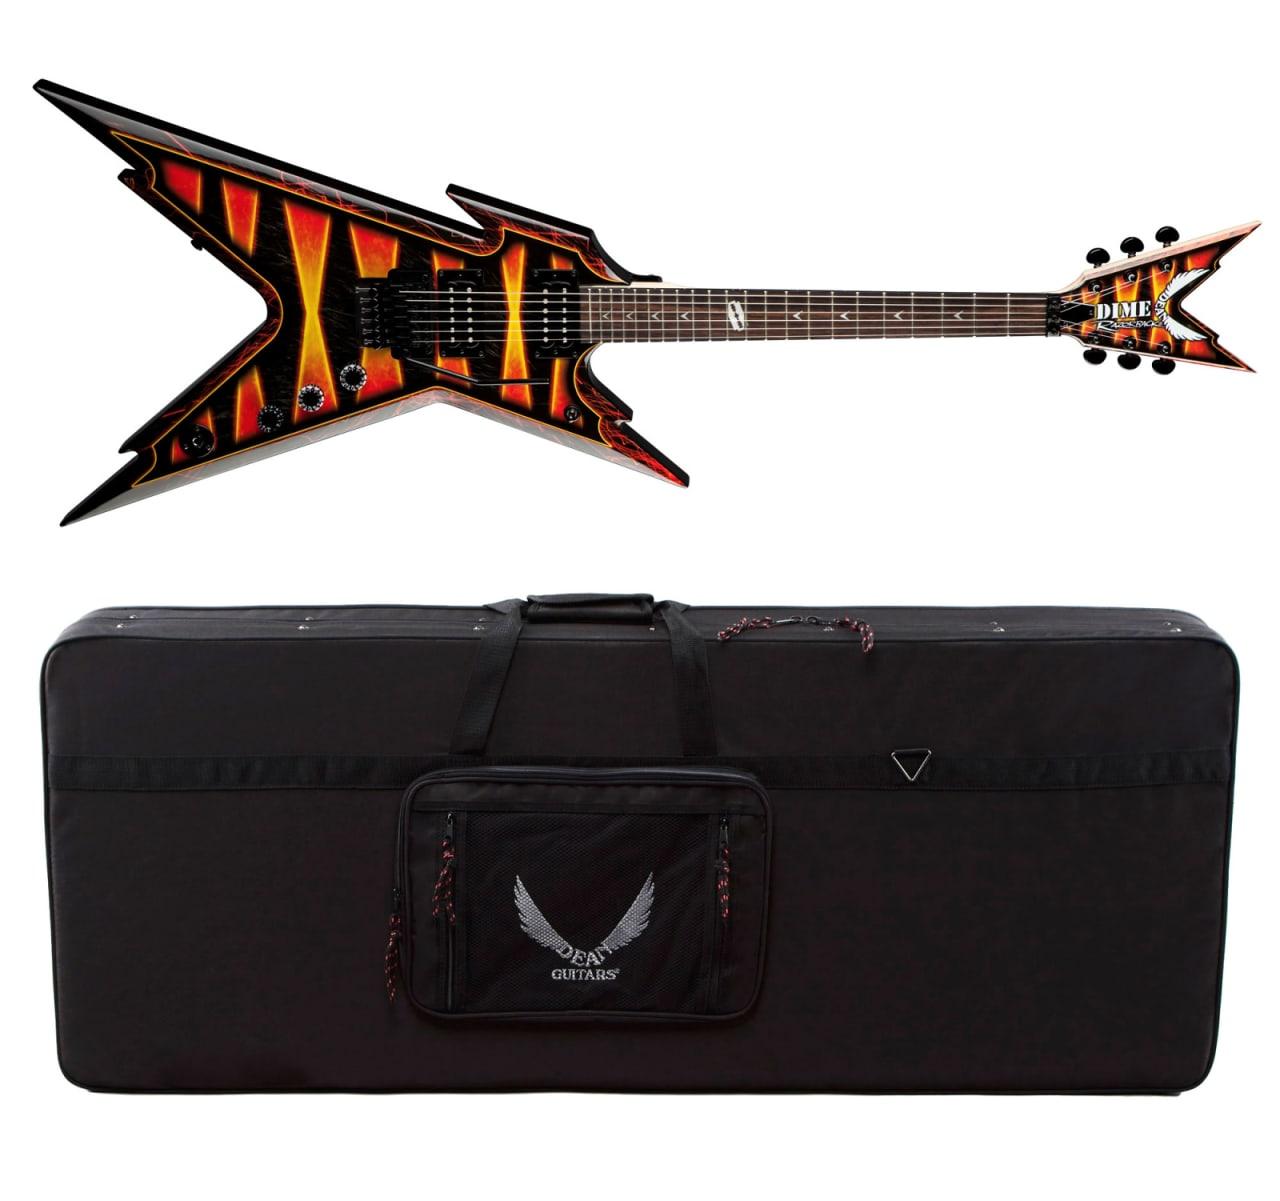 Firefly guitars